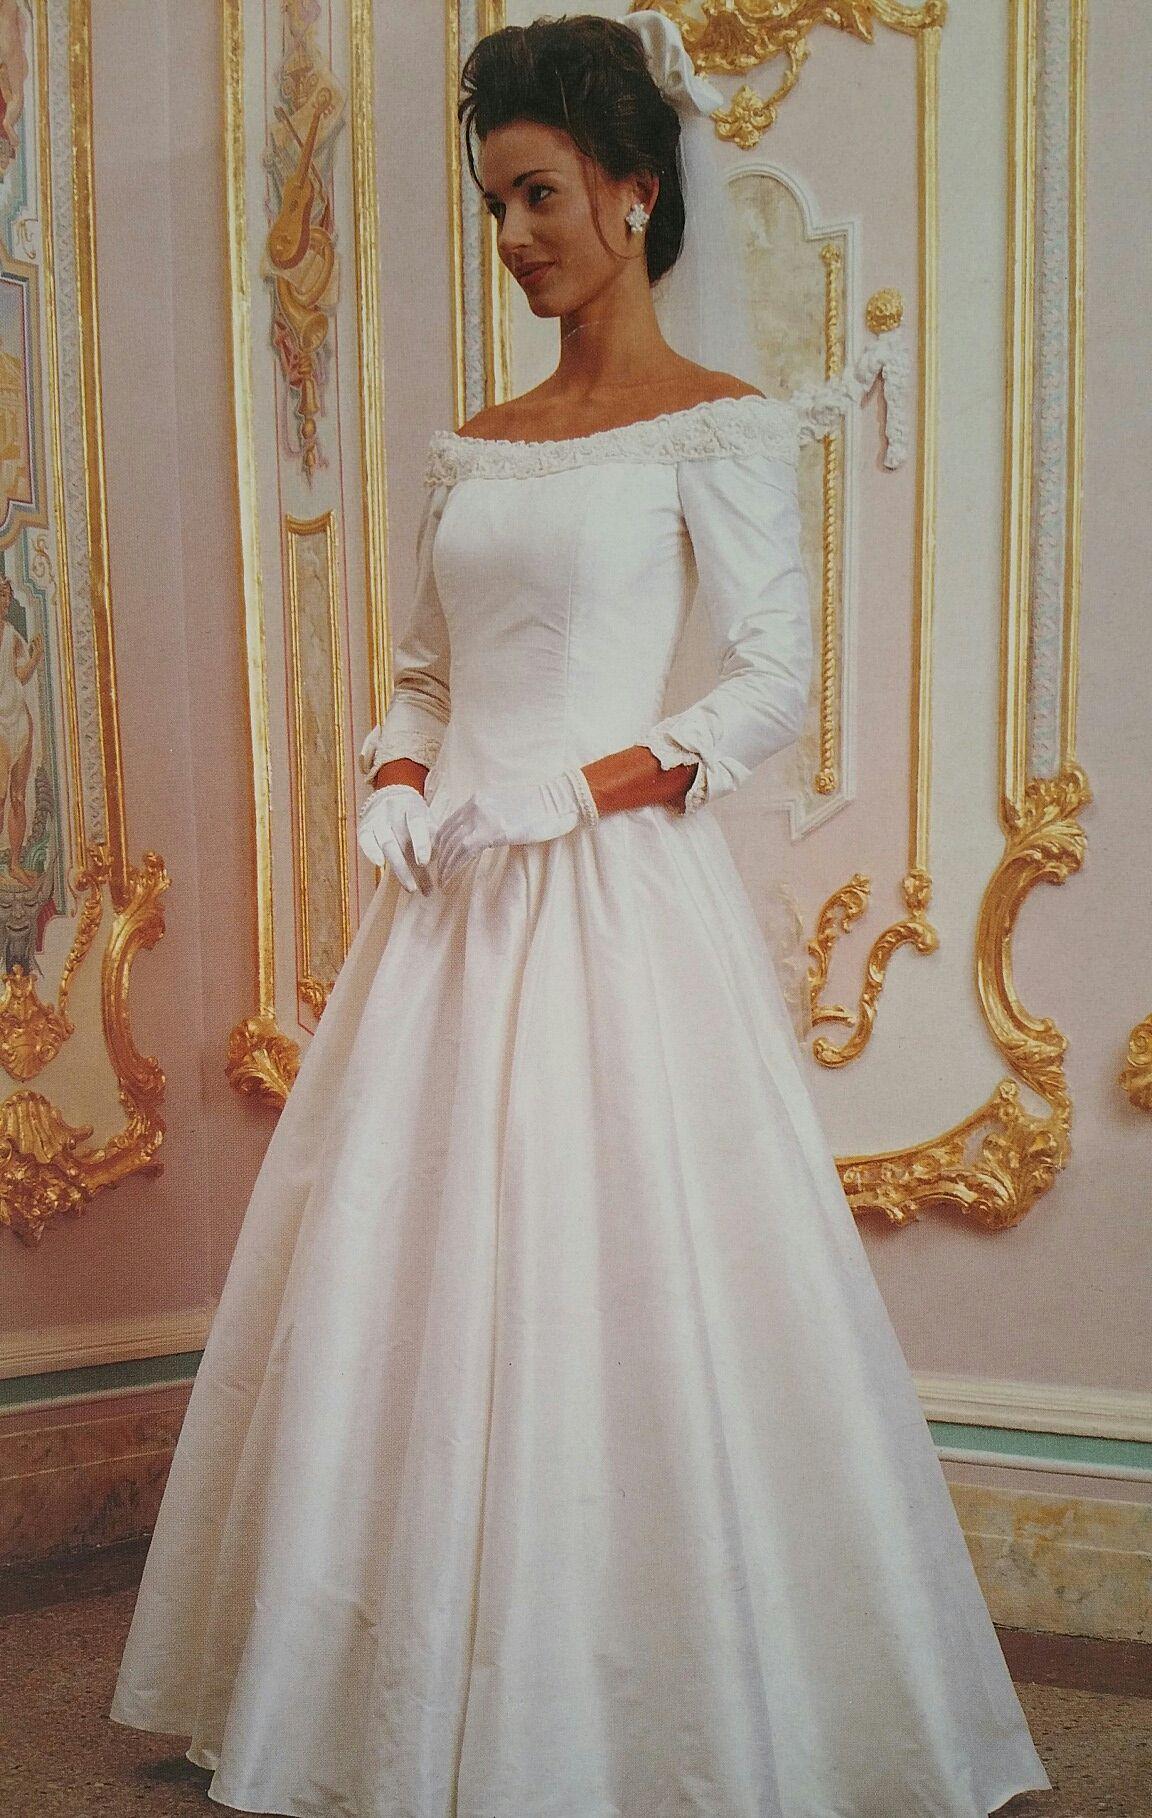 Plus size wedding dresses castleford - Vintage Wedding Dresses Vintage Weddings 30 Years Bridal Fashion